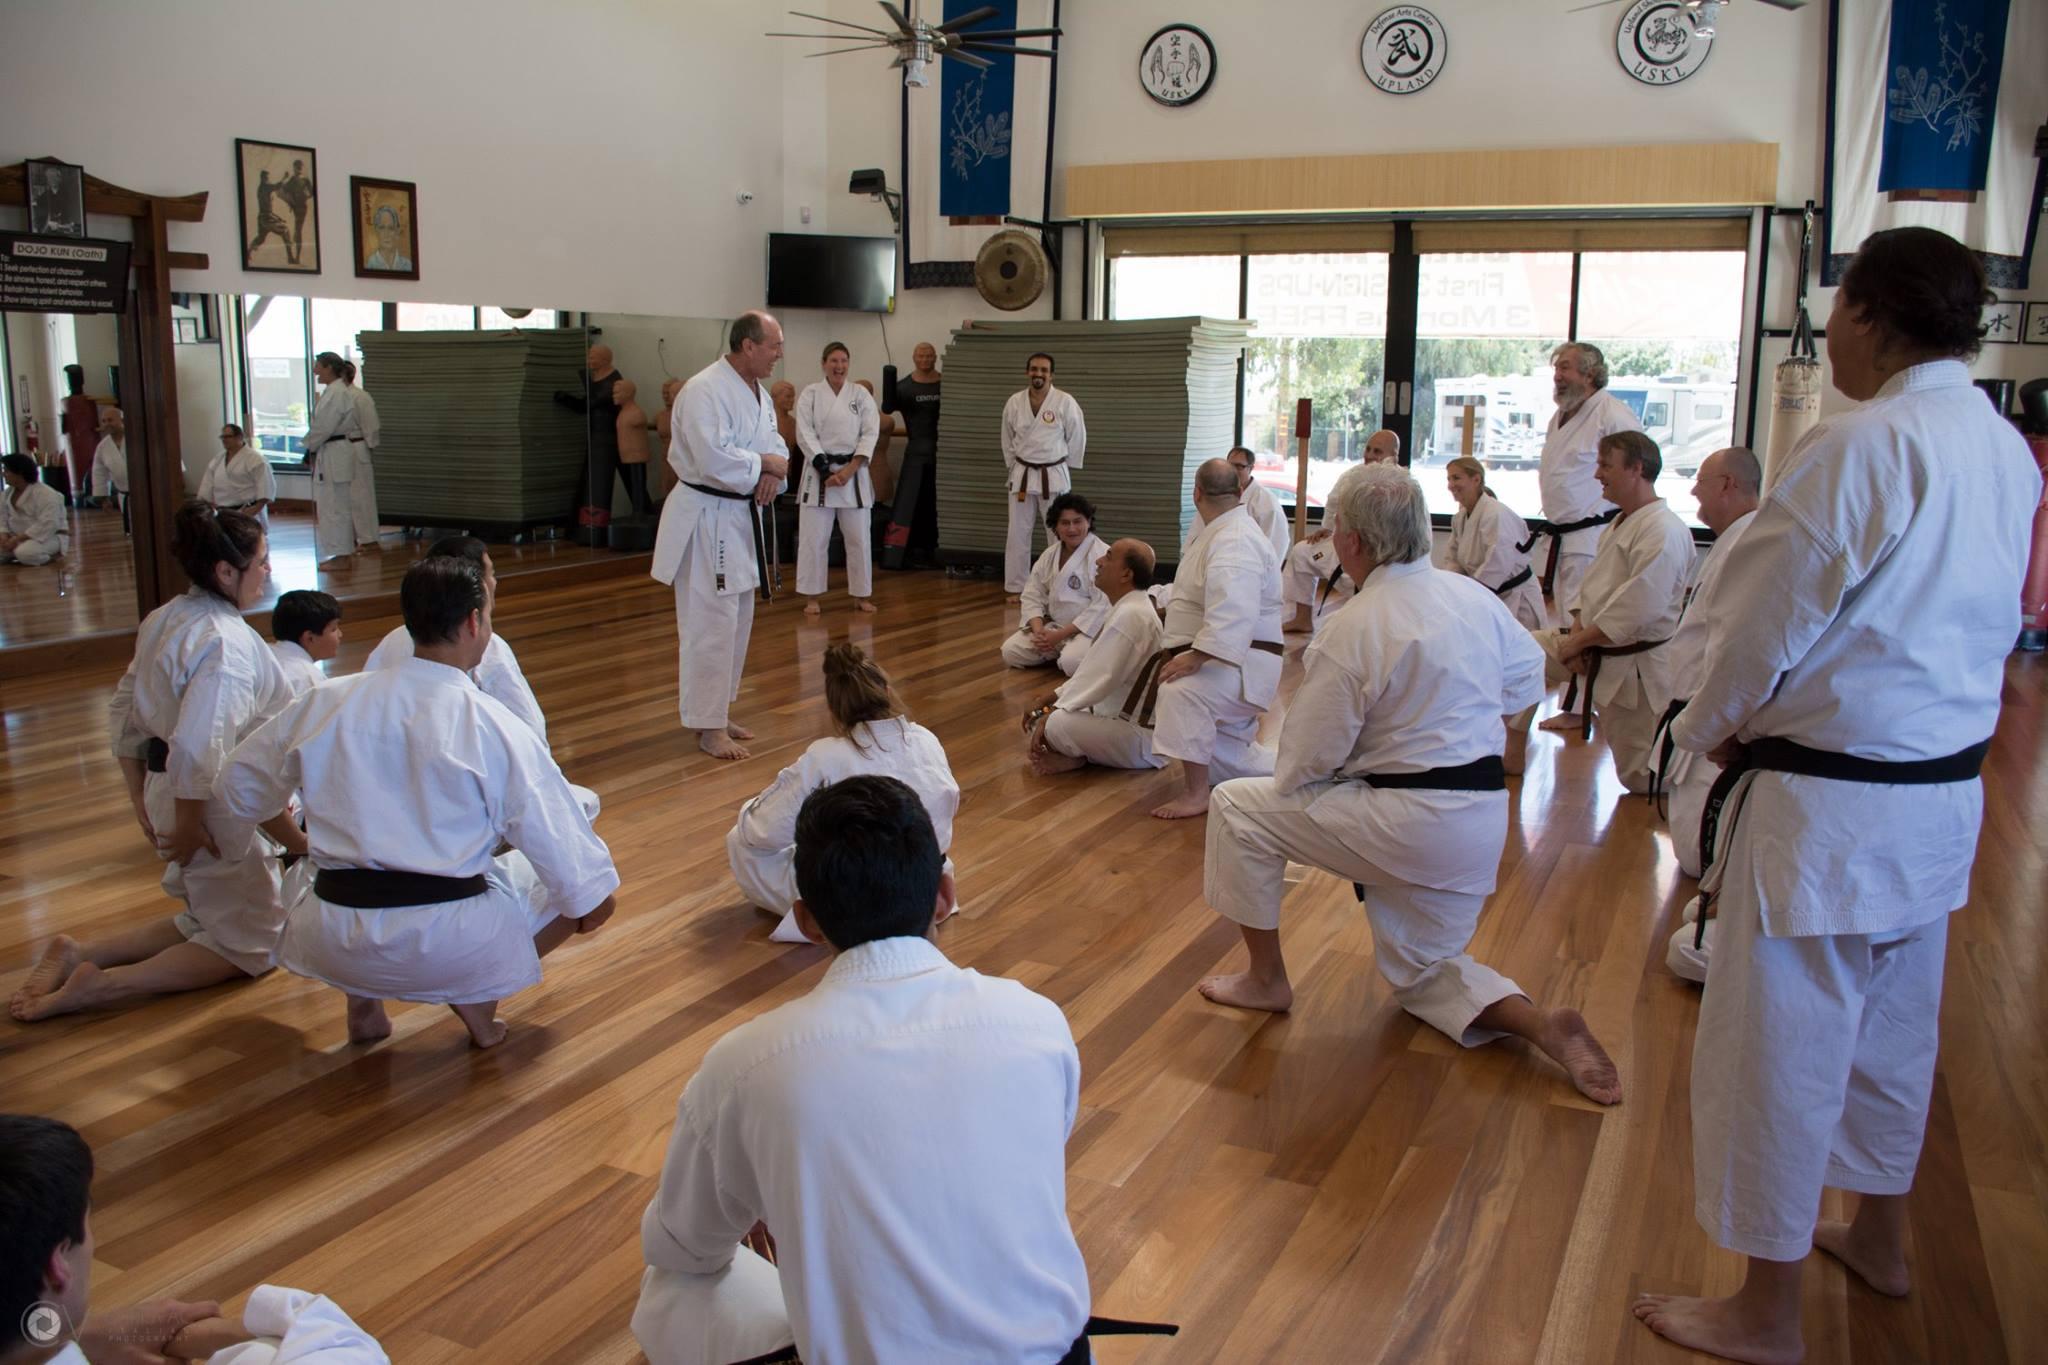 Sanchin seminar picture 5.jpg